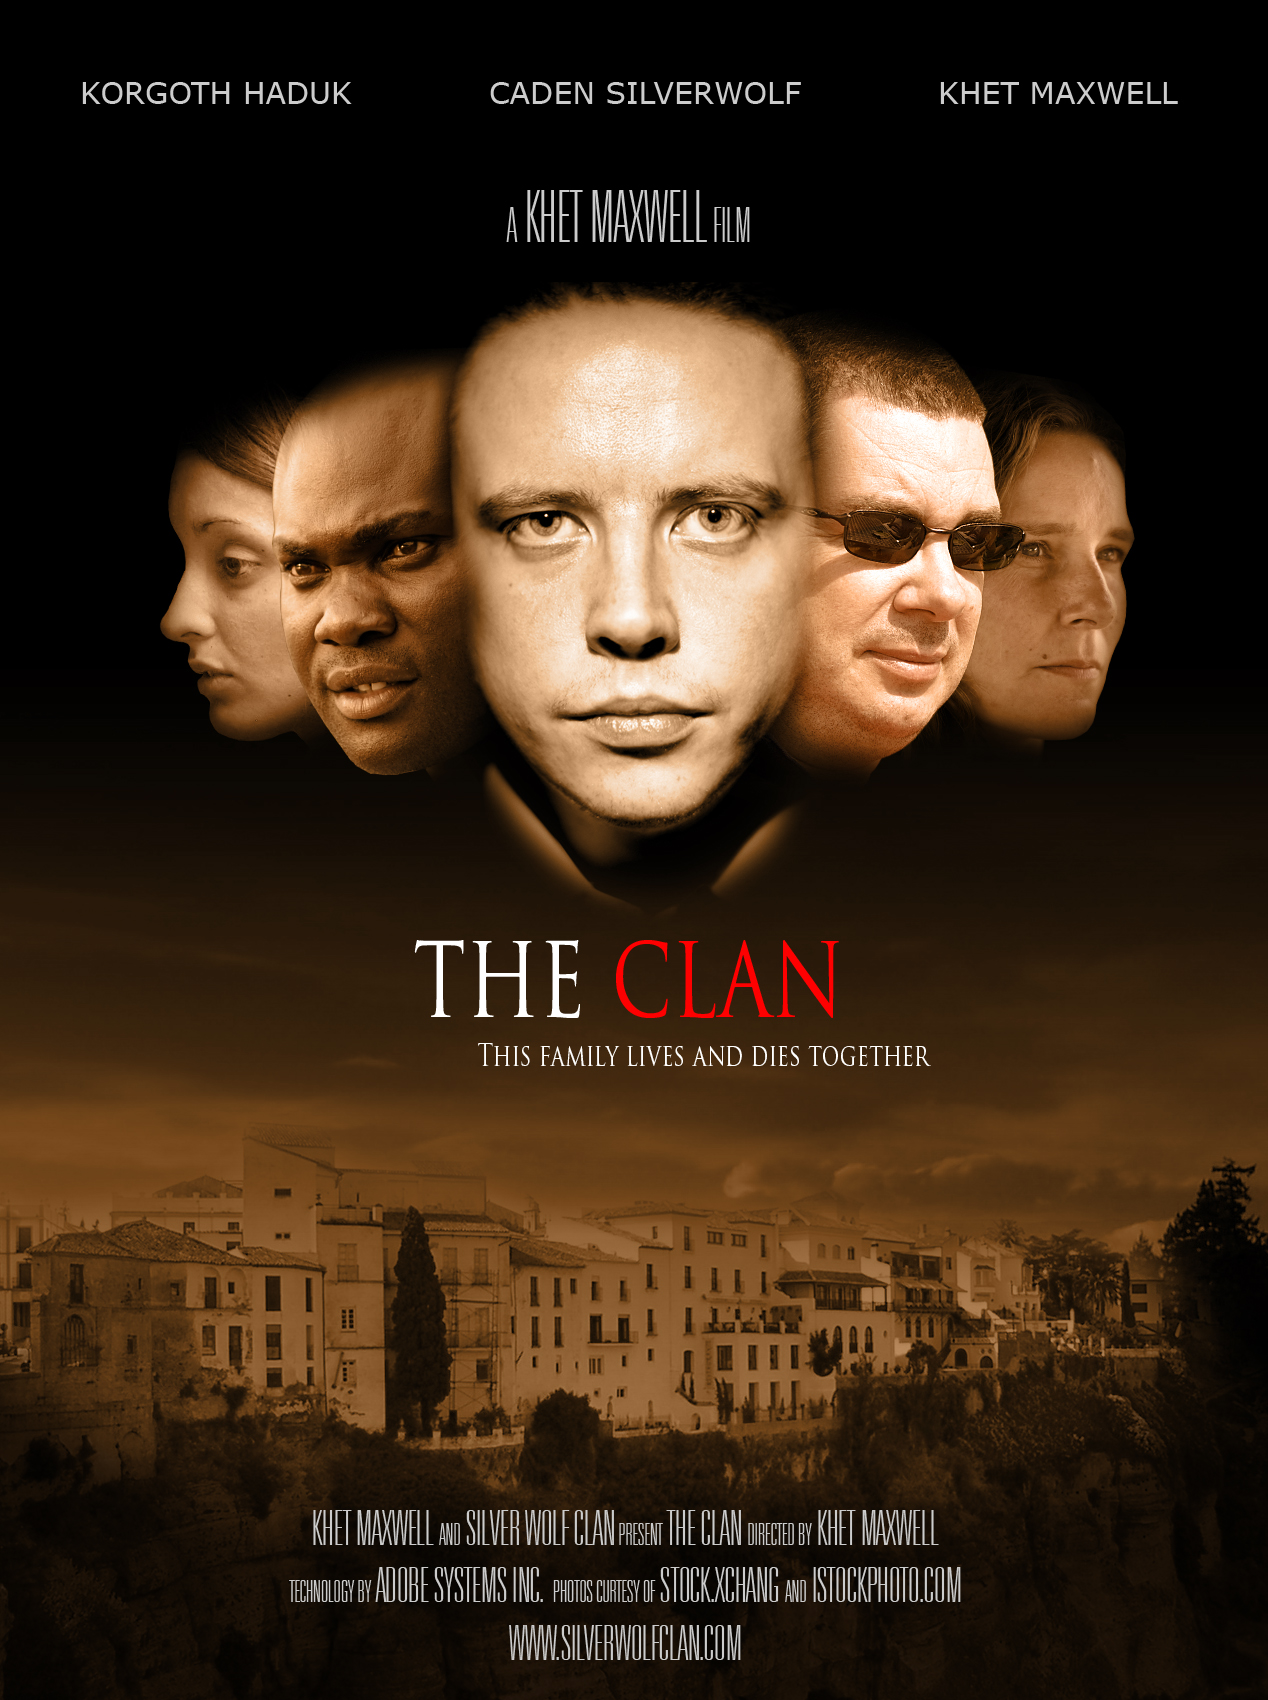 The Clan movie